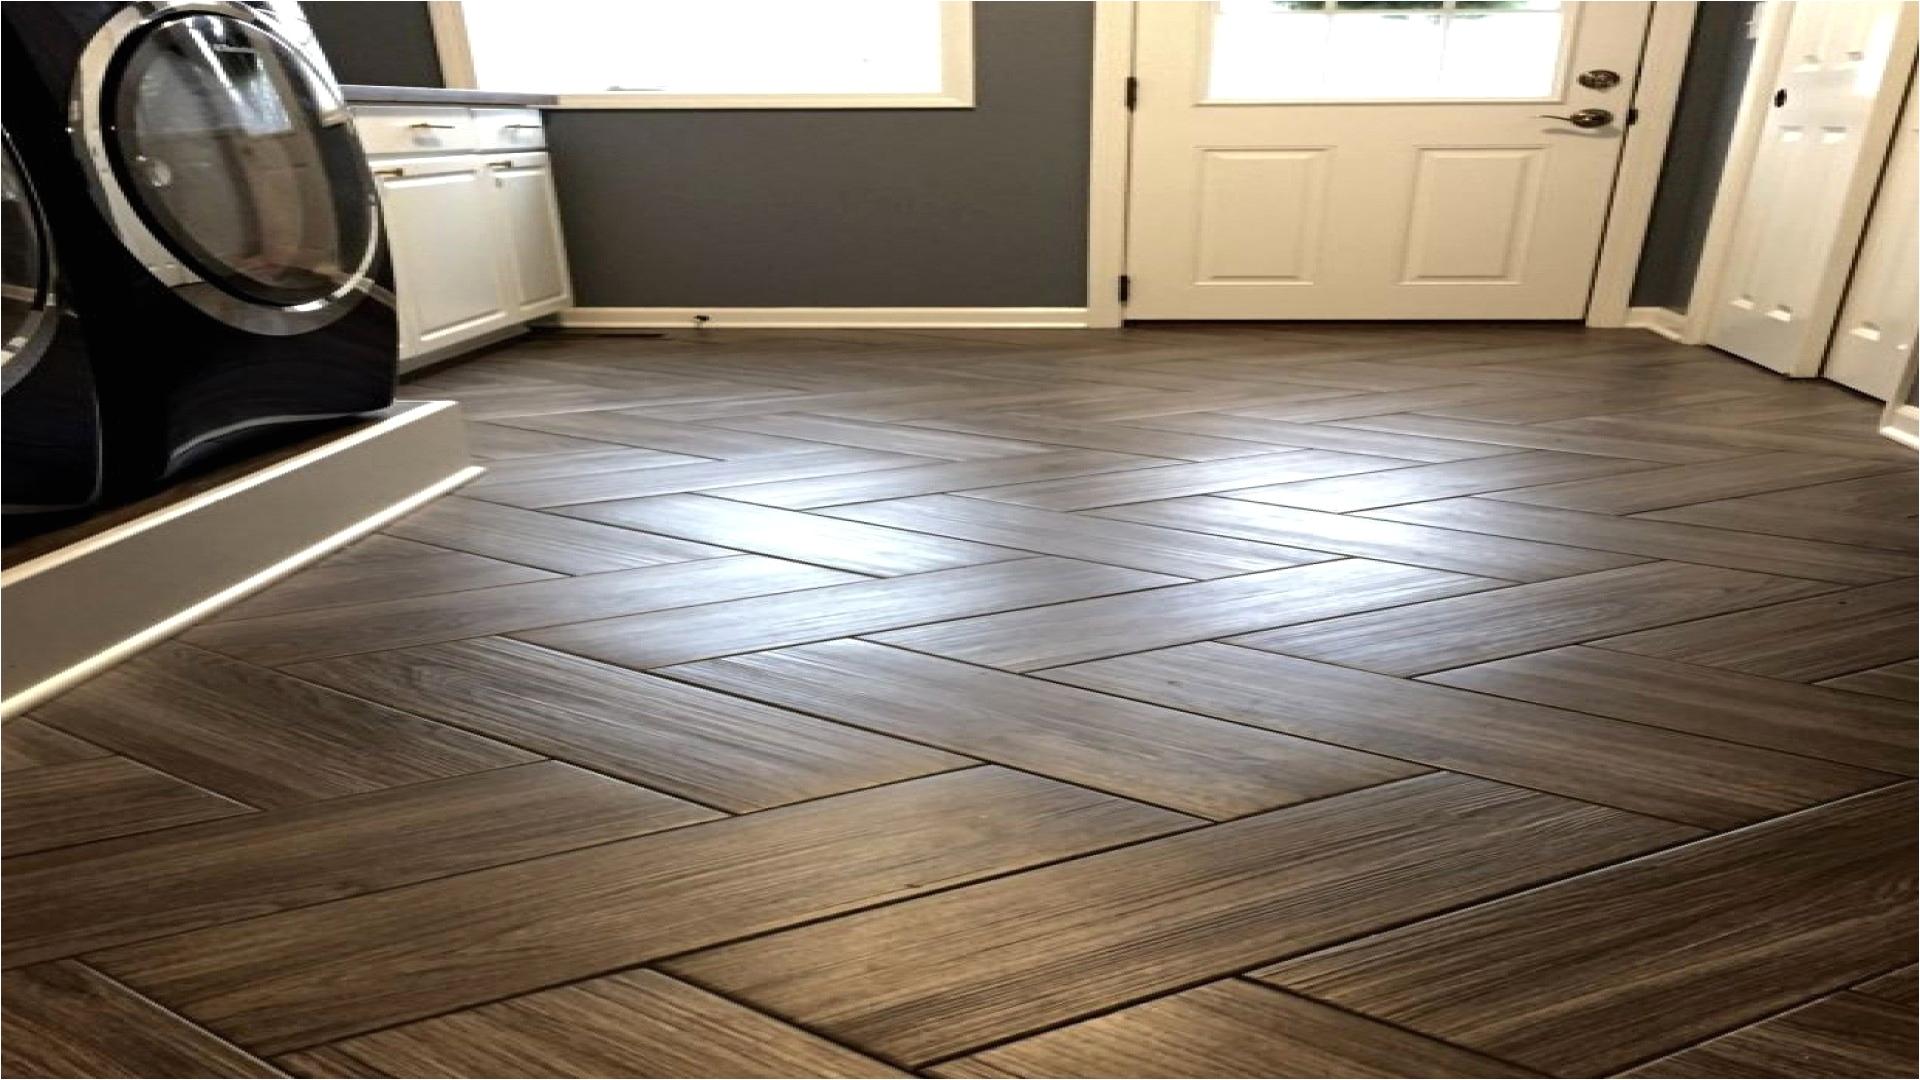 Home Depot Kitchen Flooring Vinyl Home Depot Kitchen Floor Tile 50